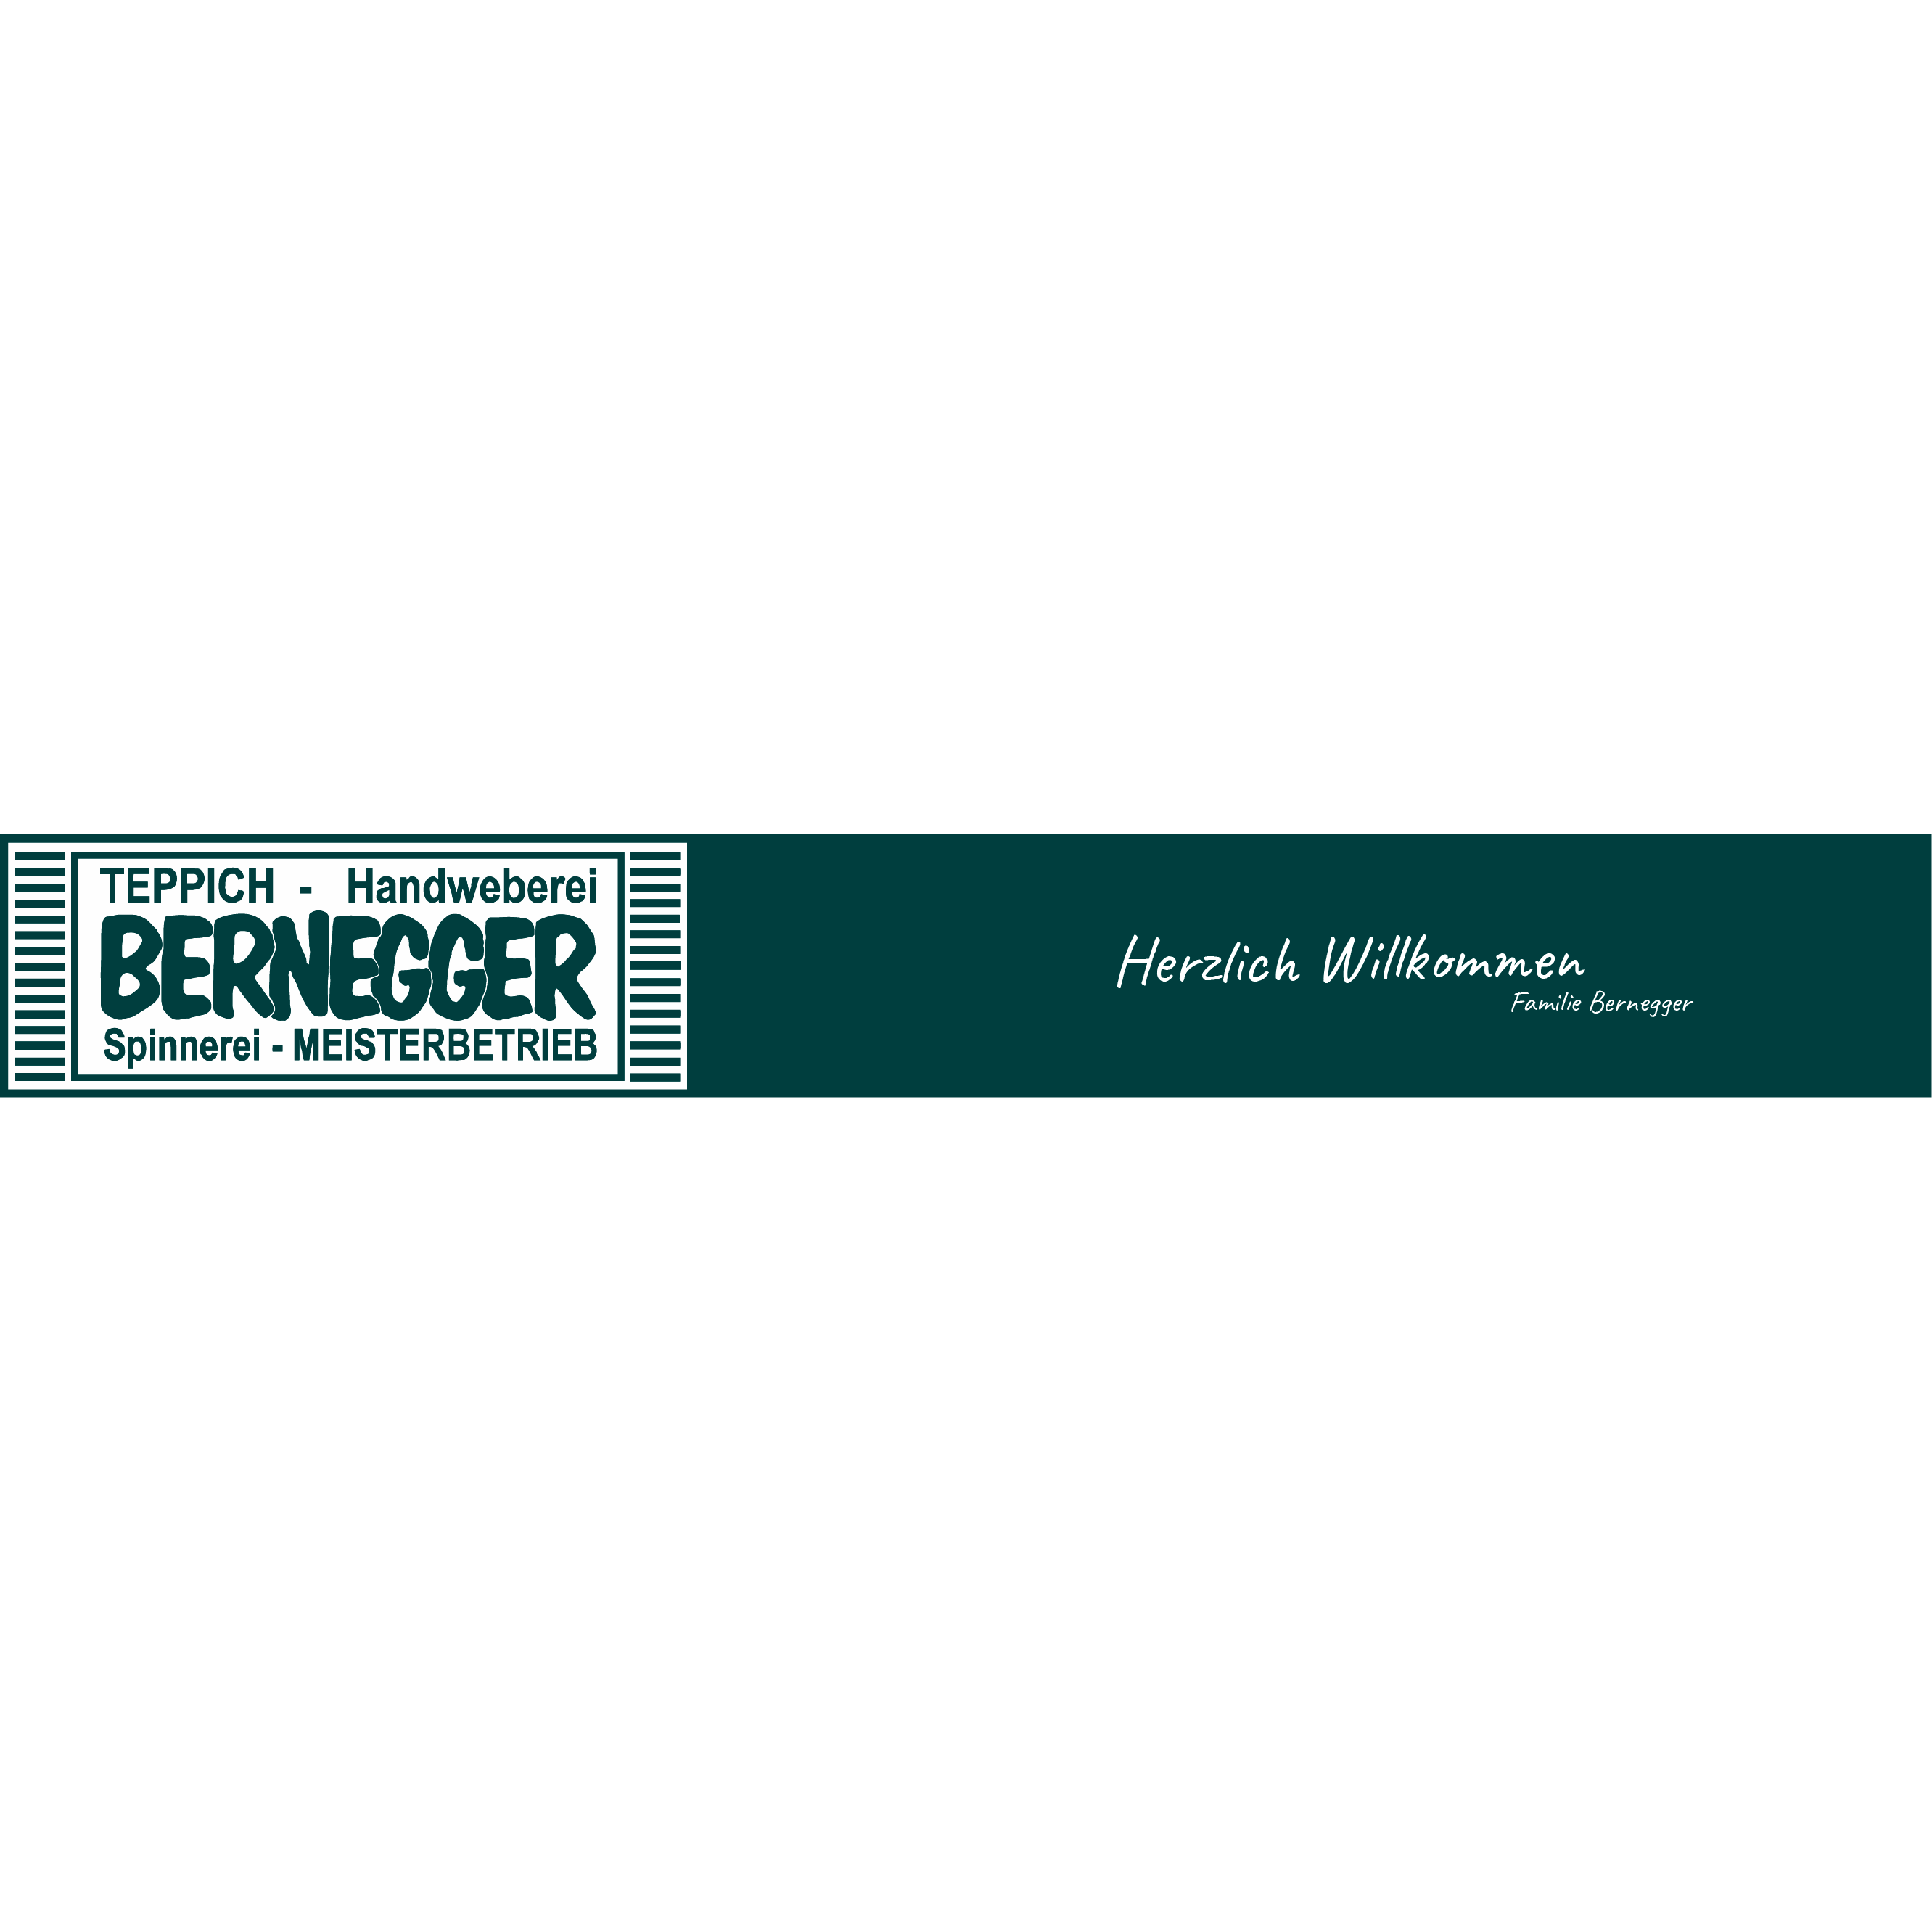 Teppich Weberei Bernegger e.K.